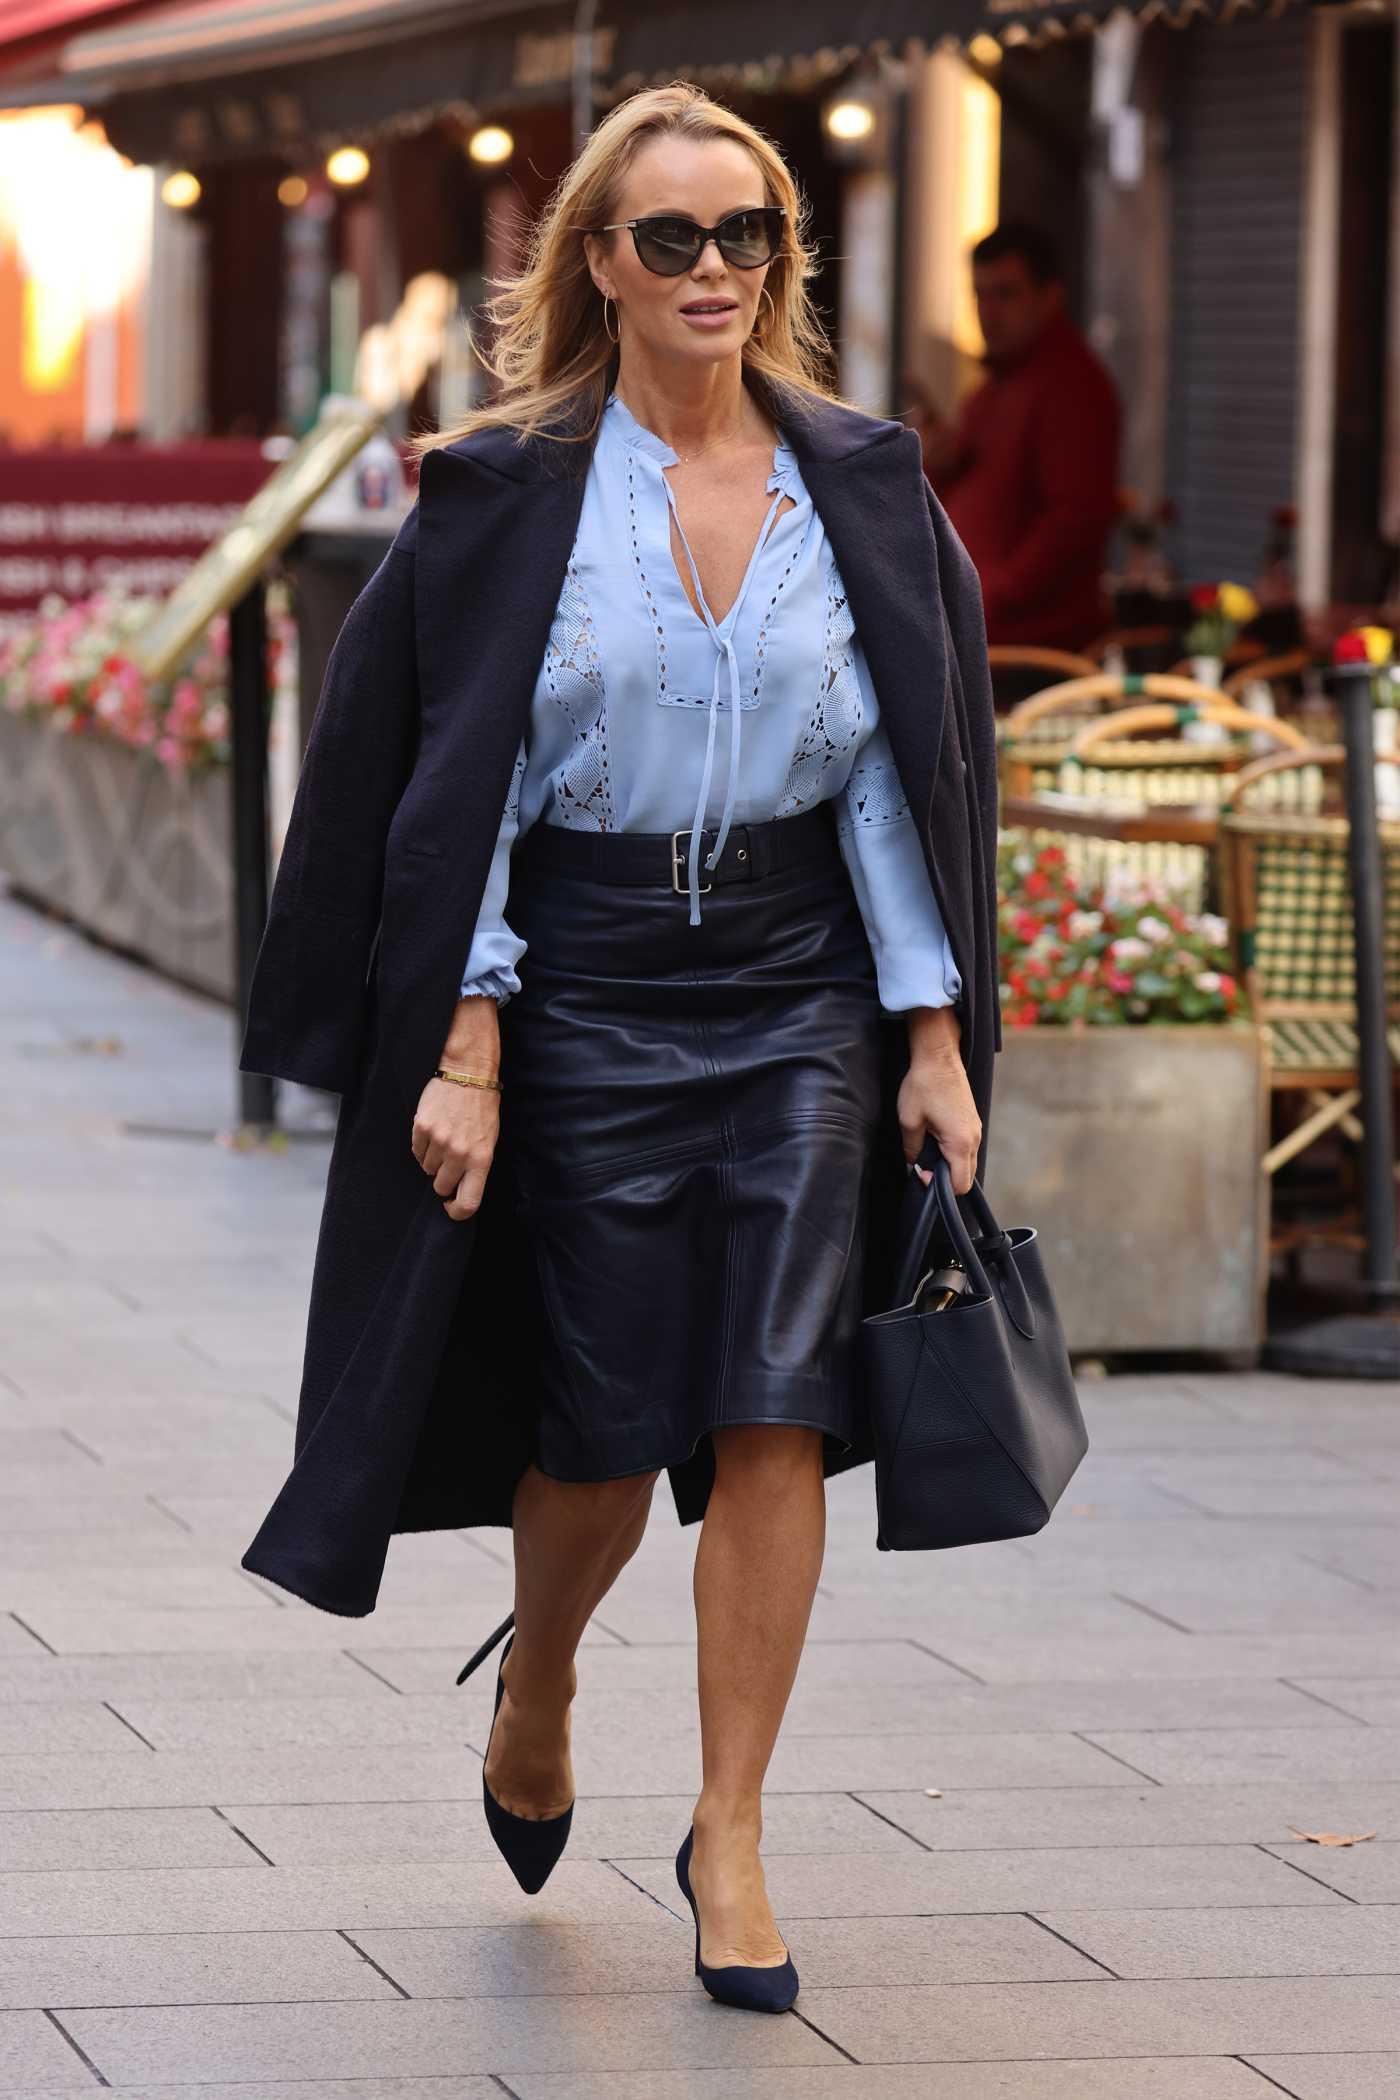 Amanda Holden in a Black Coat Leaves the Global Radio Studios in London 09/29/2021